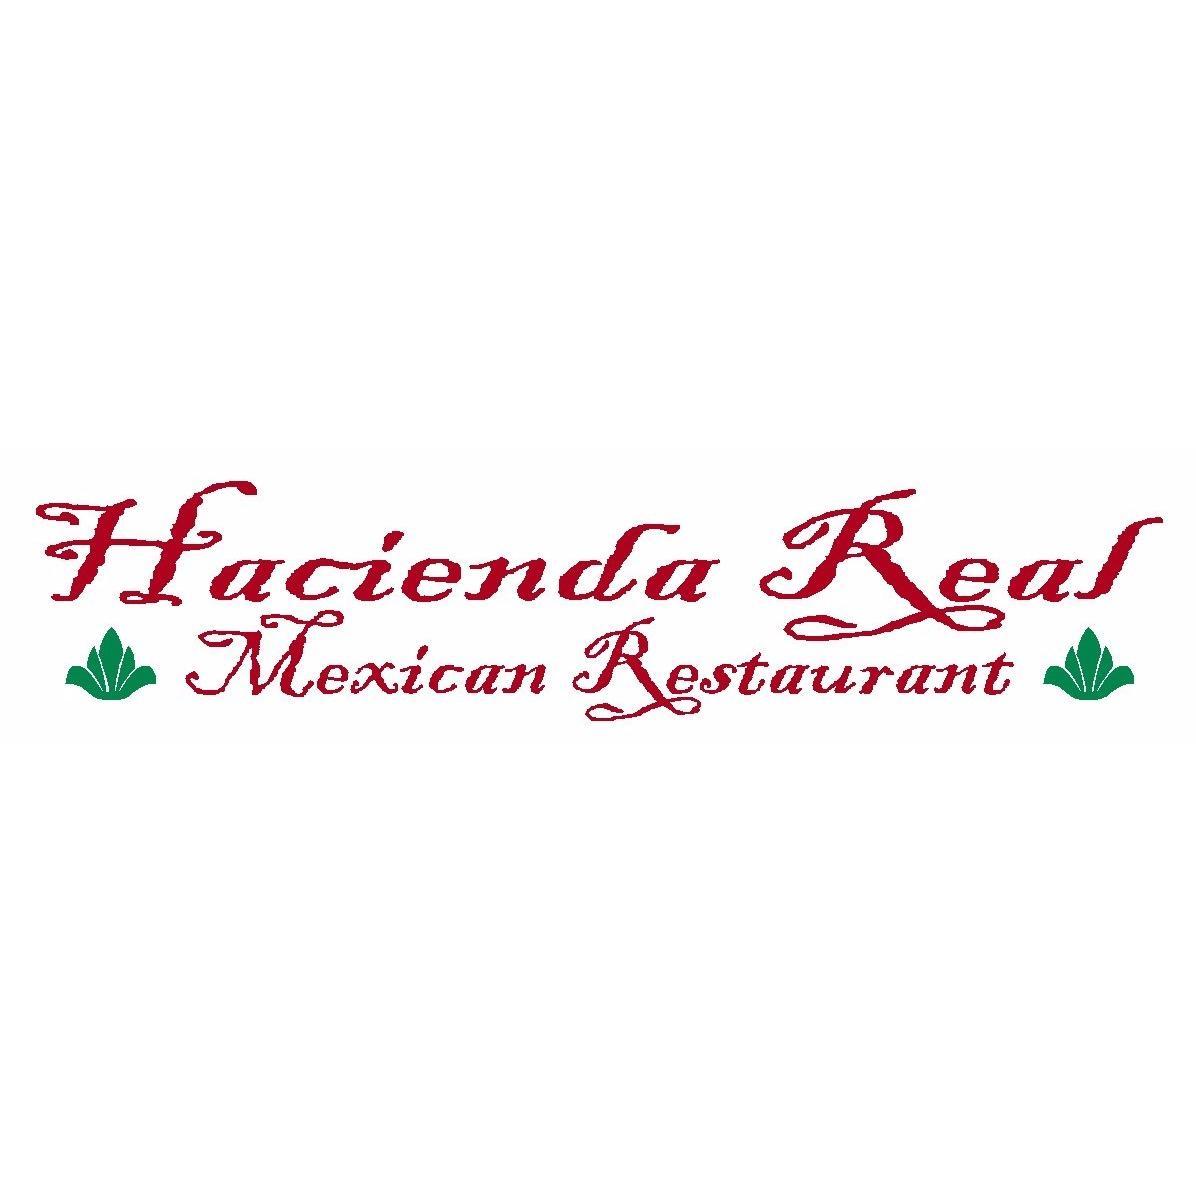 Hacienda Real Mexican Restaurant of Breaux Bridge